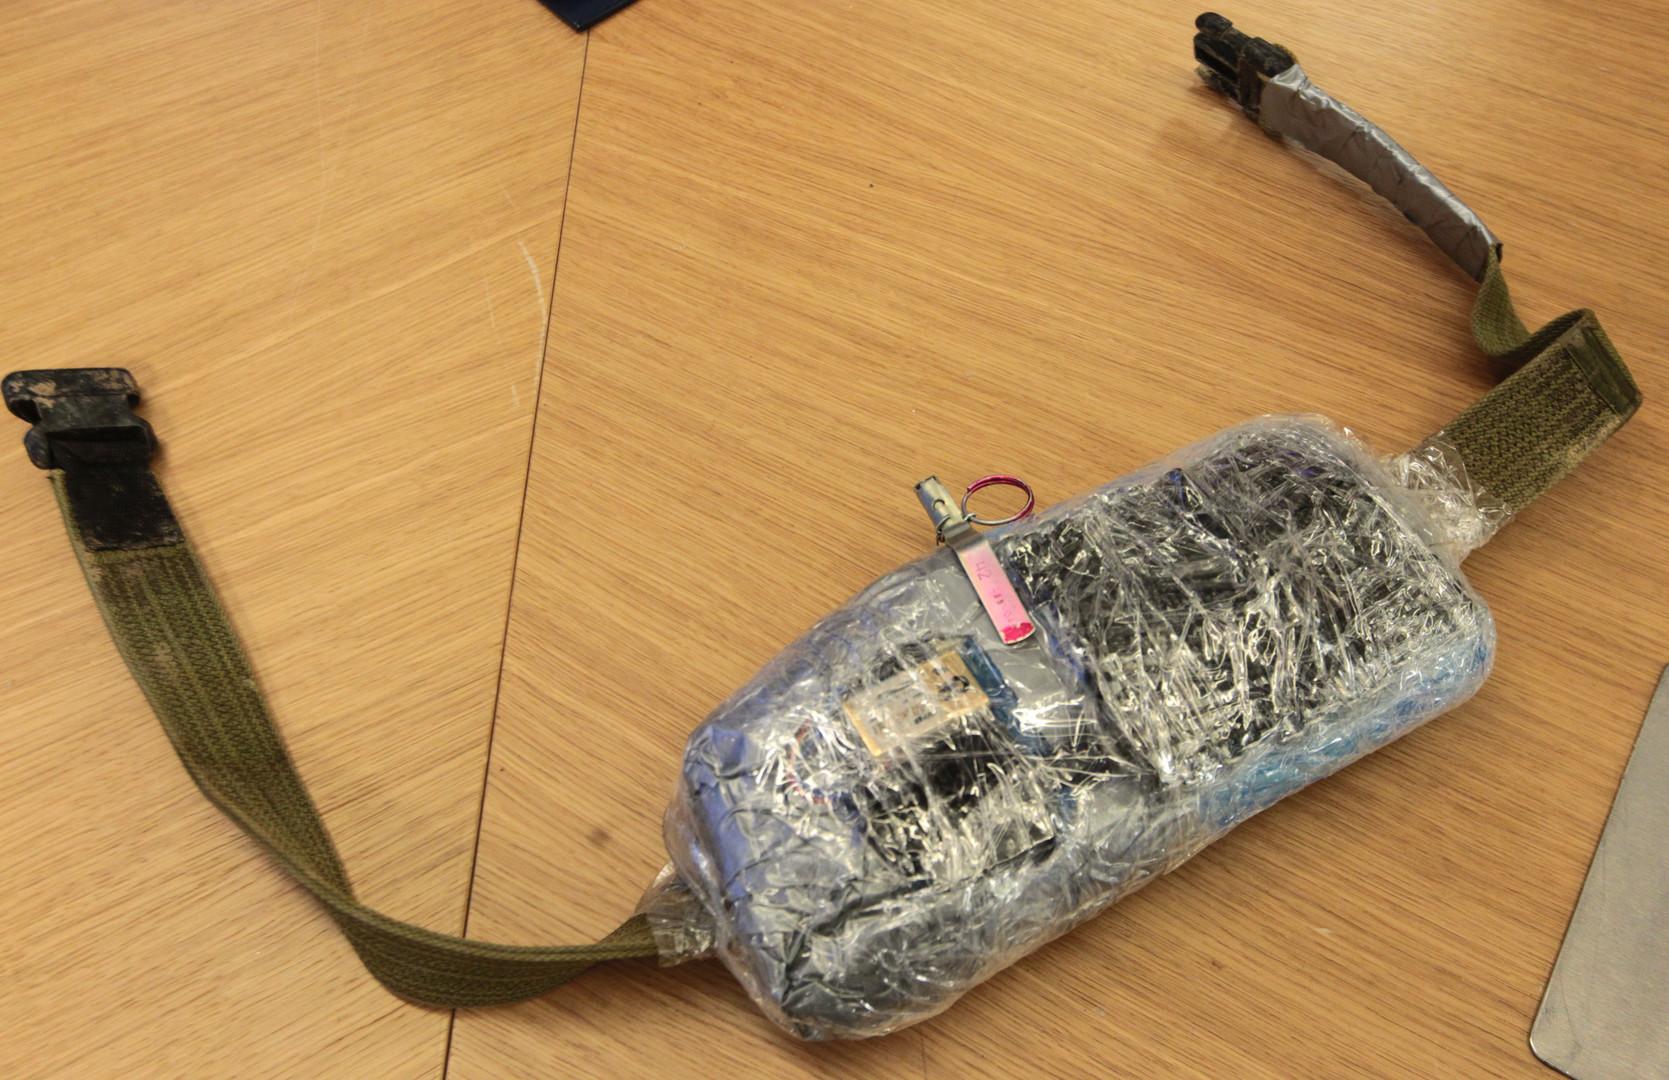 Une ceinture d'explosifs